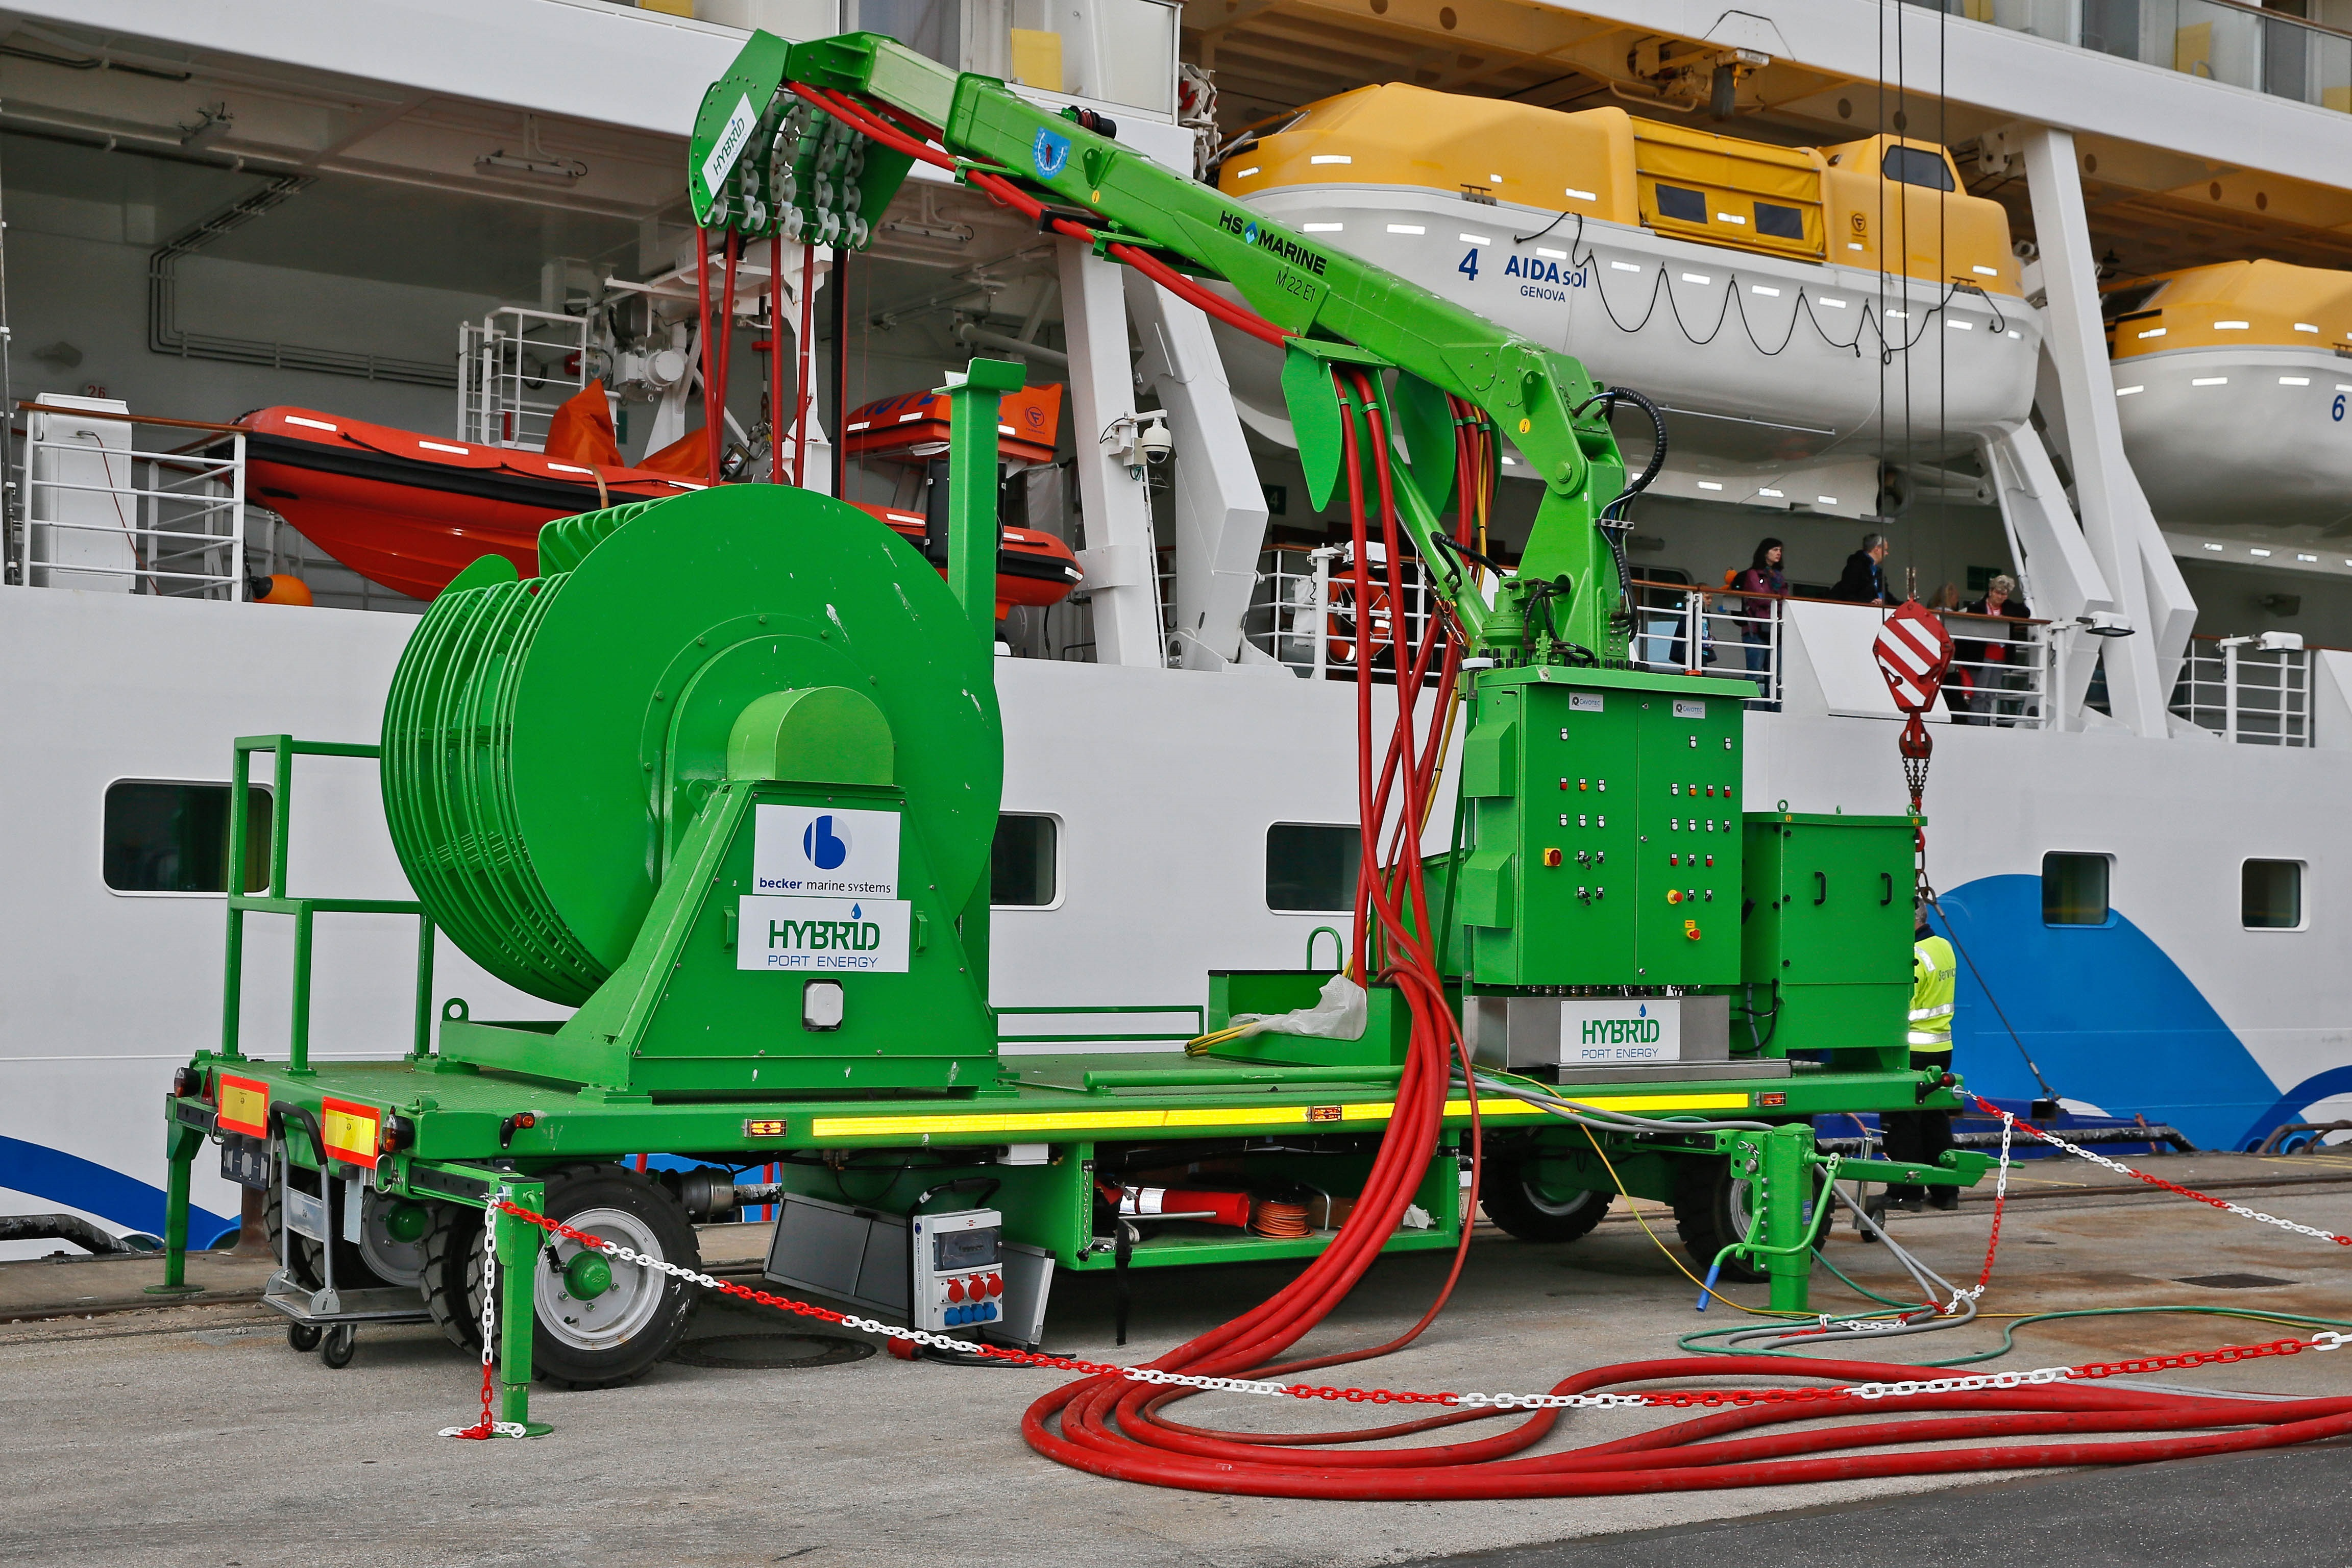 AIDAsol_Versorgung LNG Hybrid Barge 3